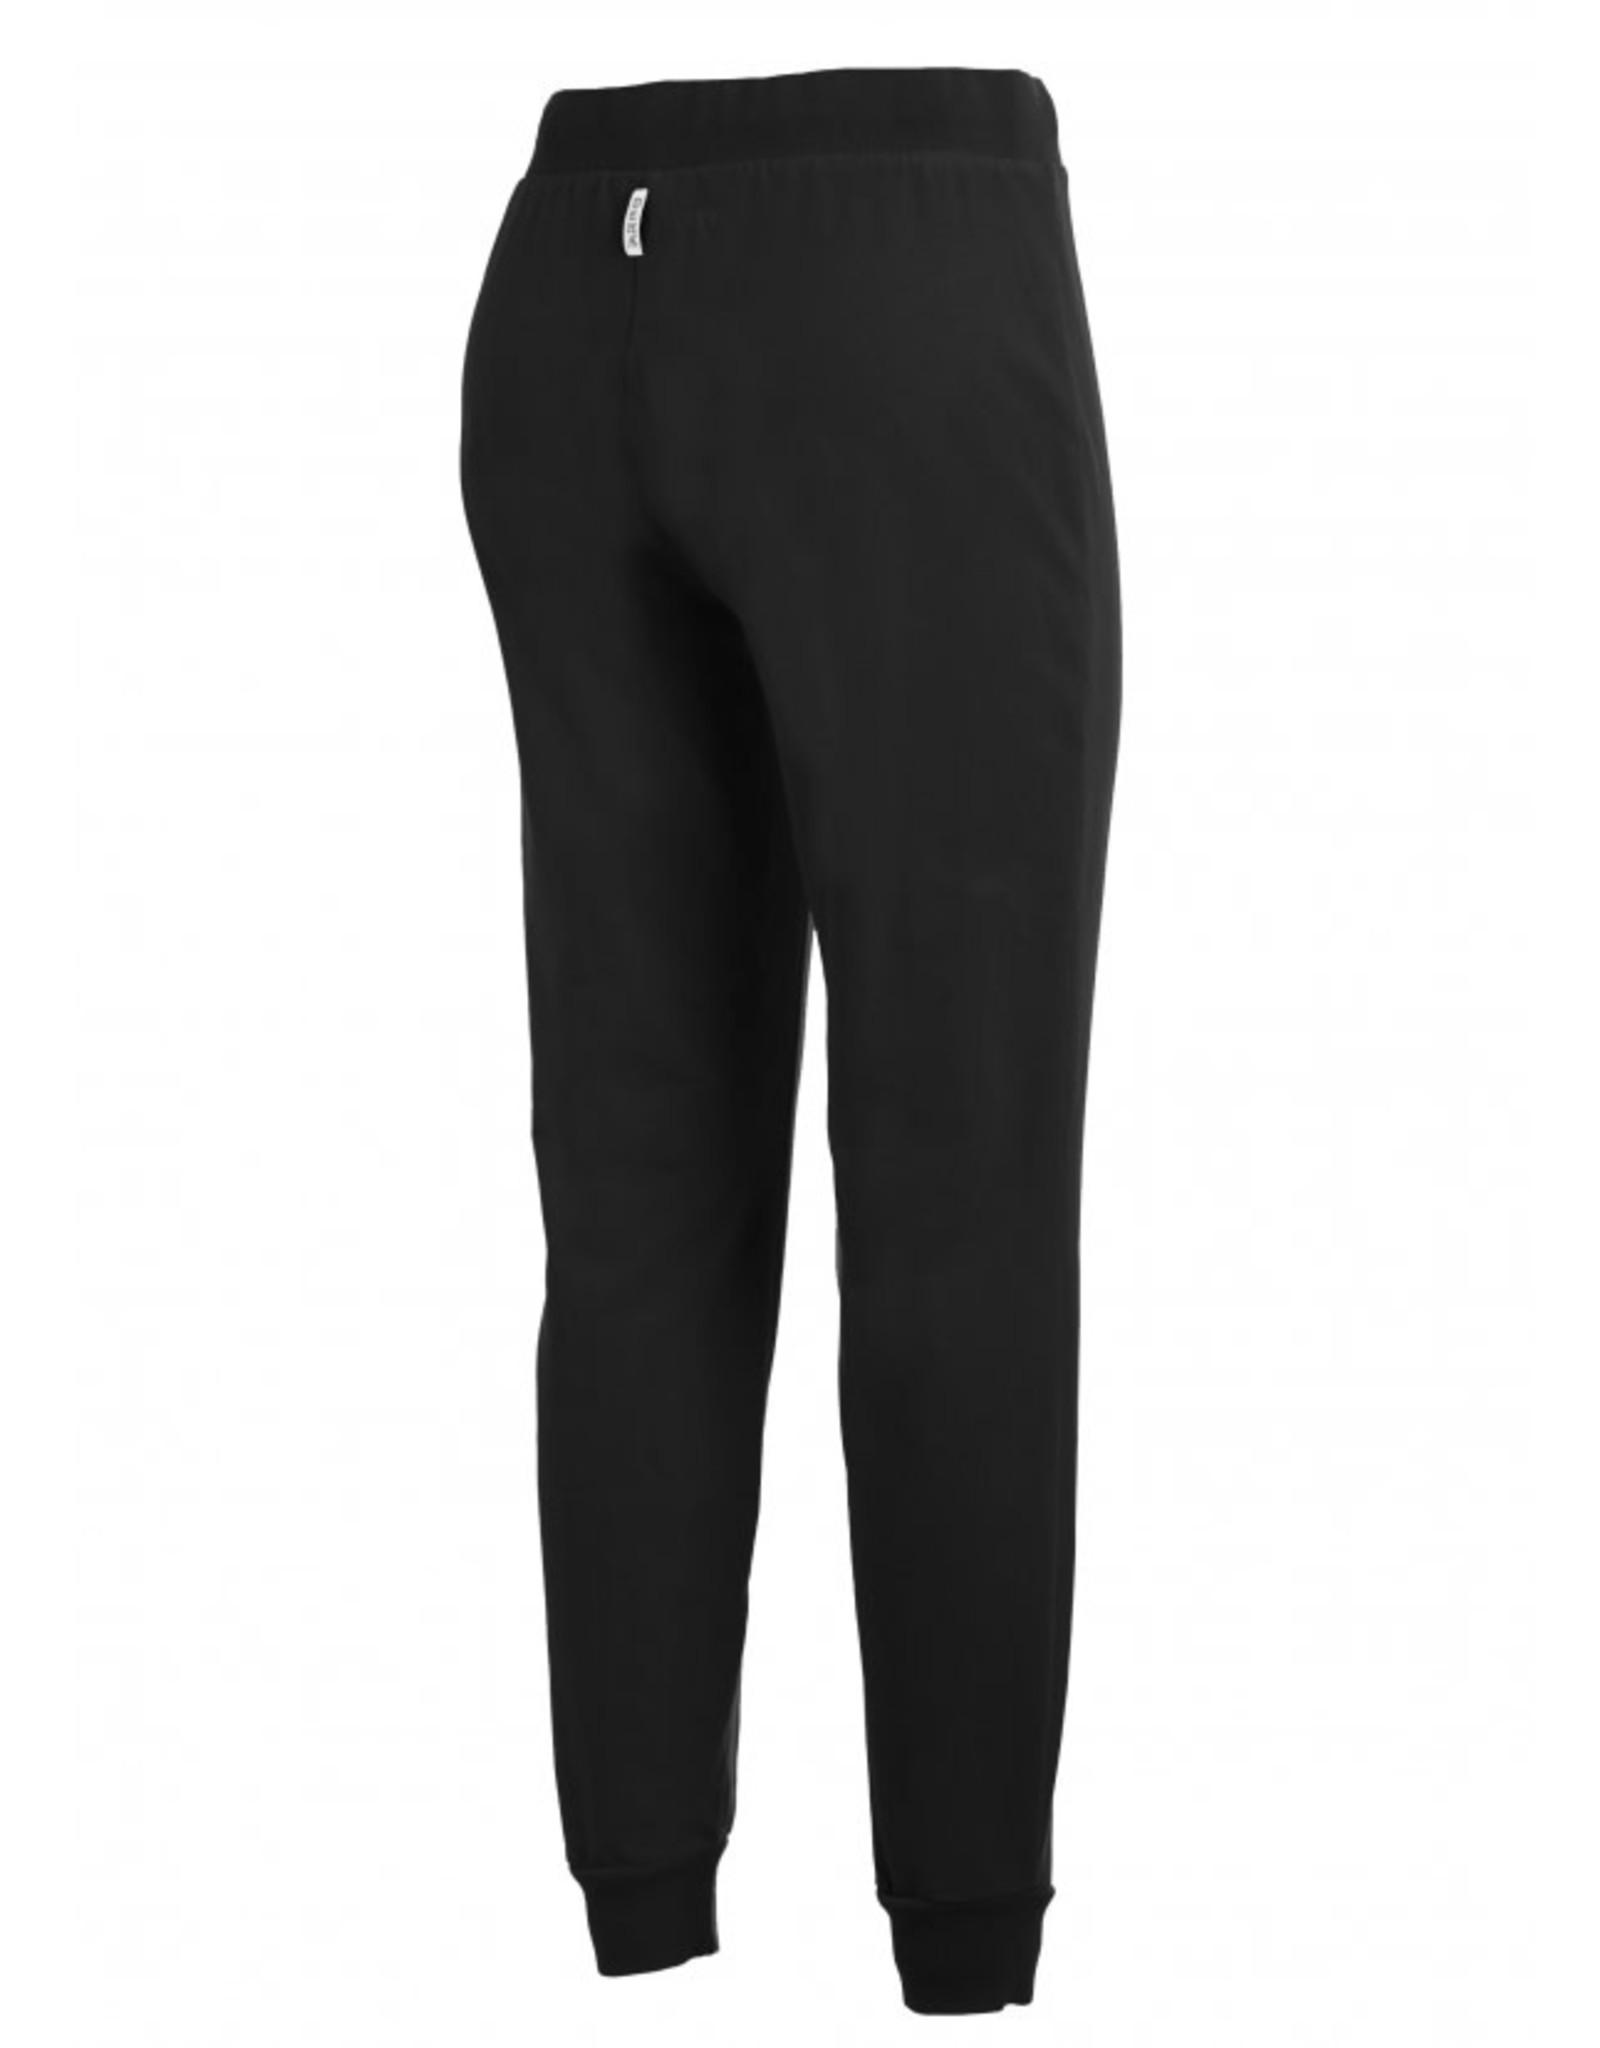 Deha SS21 B44738 Jogger Pants With Pockets